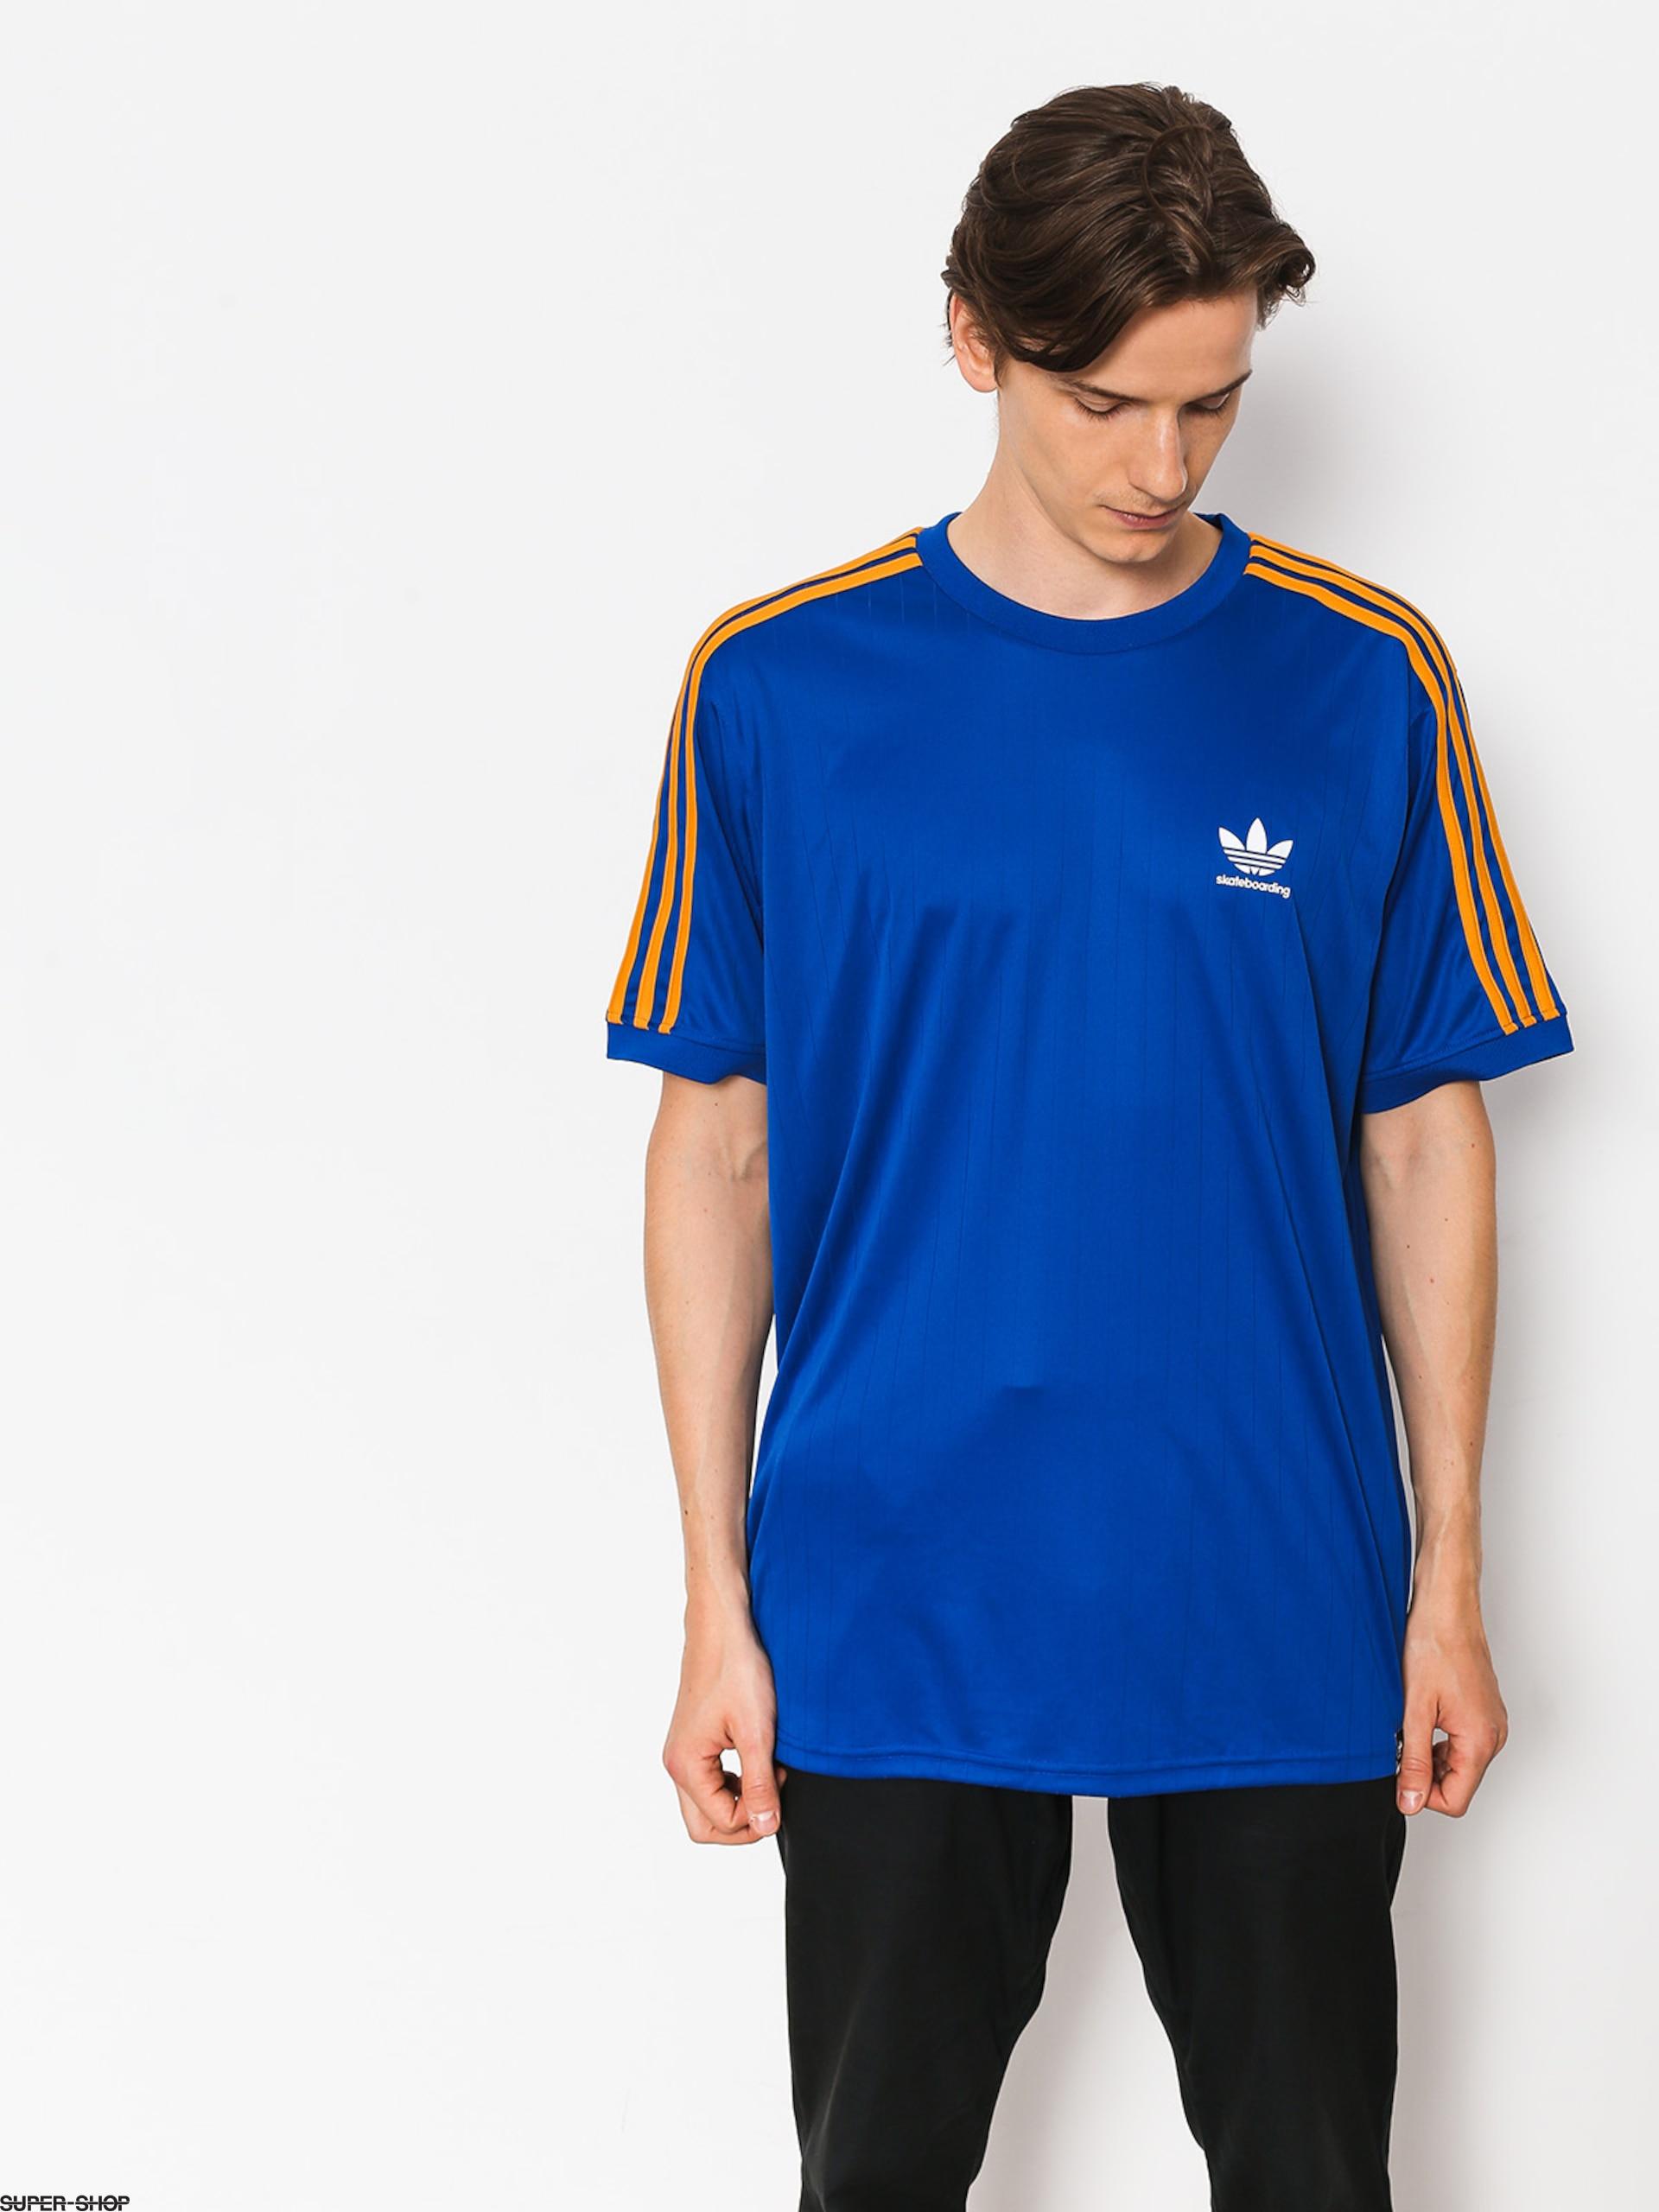 a1e0d6ce6 adidas T-shirt Bluza Clima Club Jers (collegiate royal/tactile yellow f17)